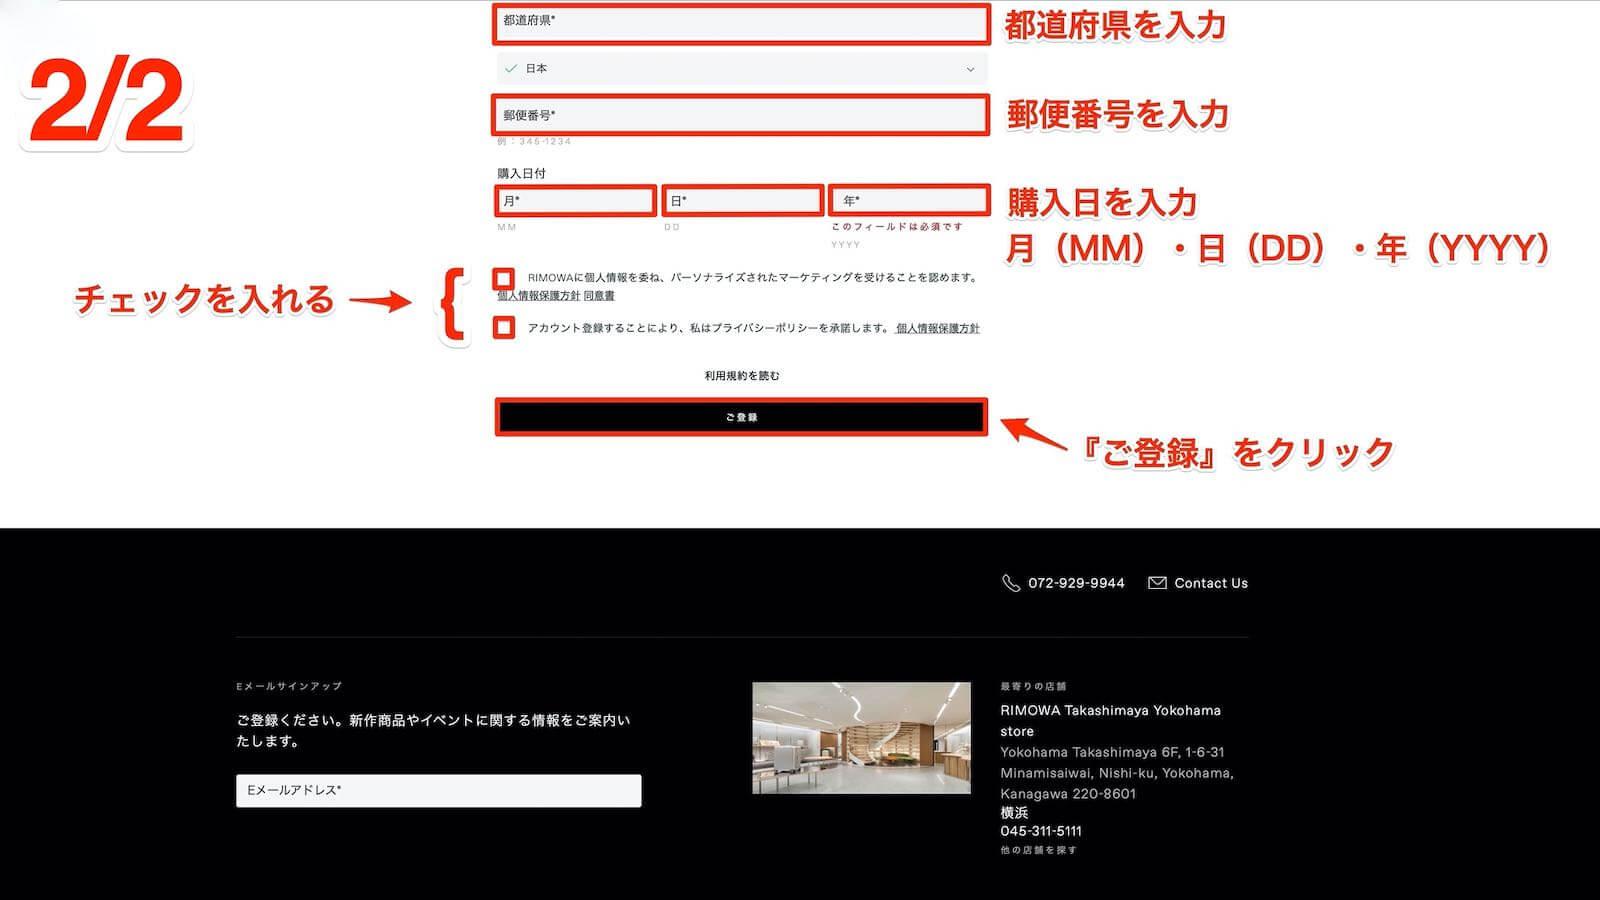 0229 Rimowa online registration method 12